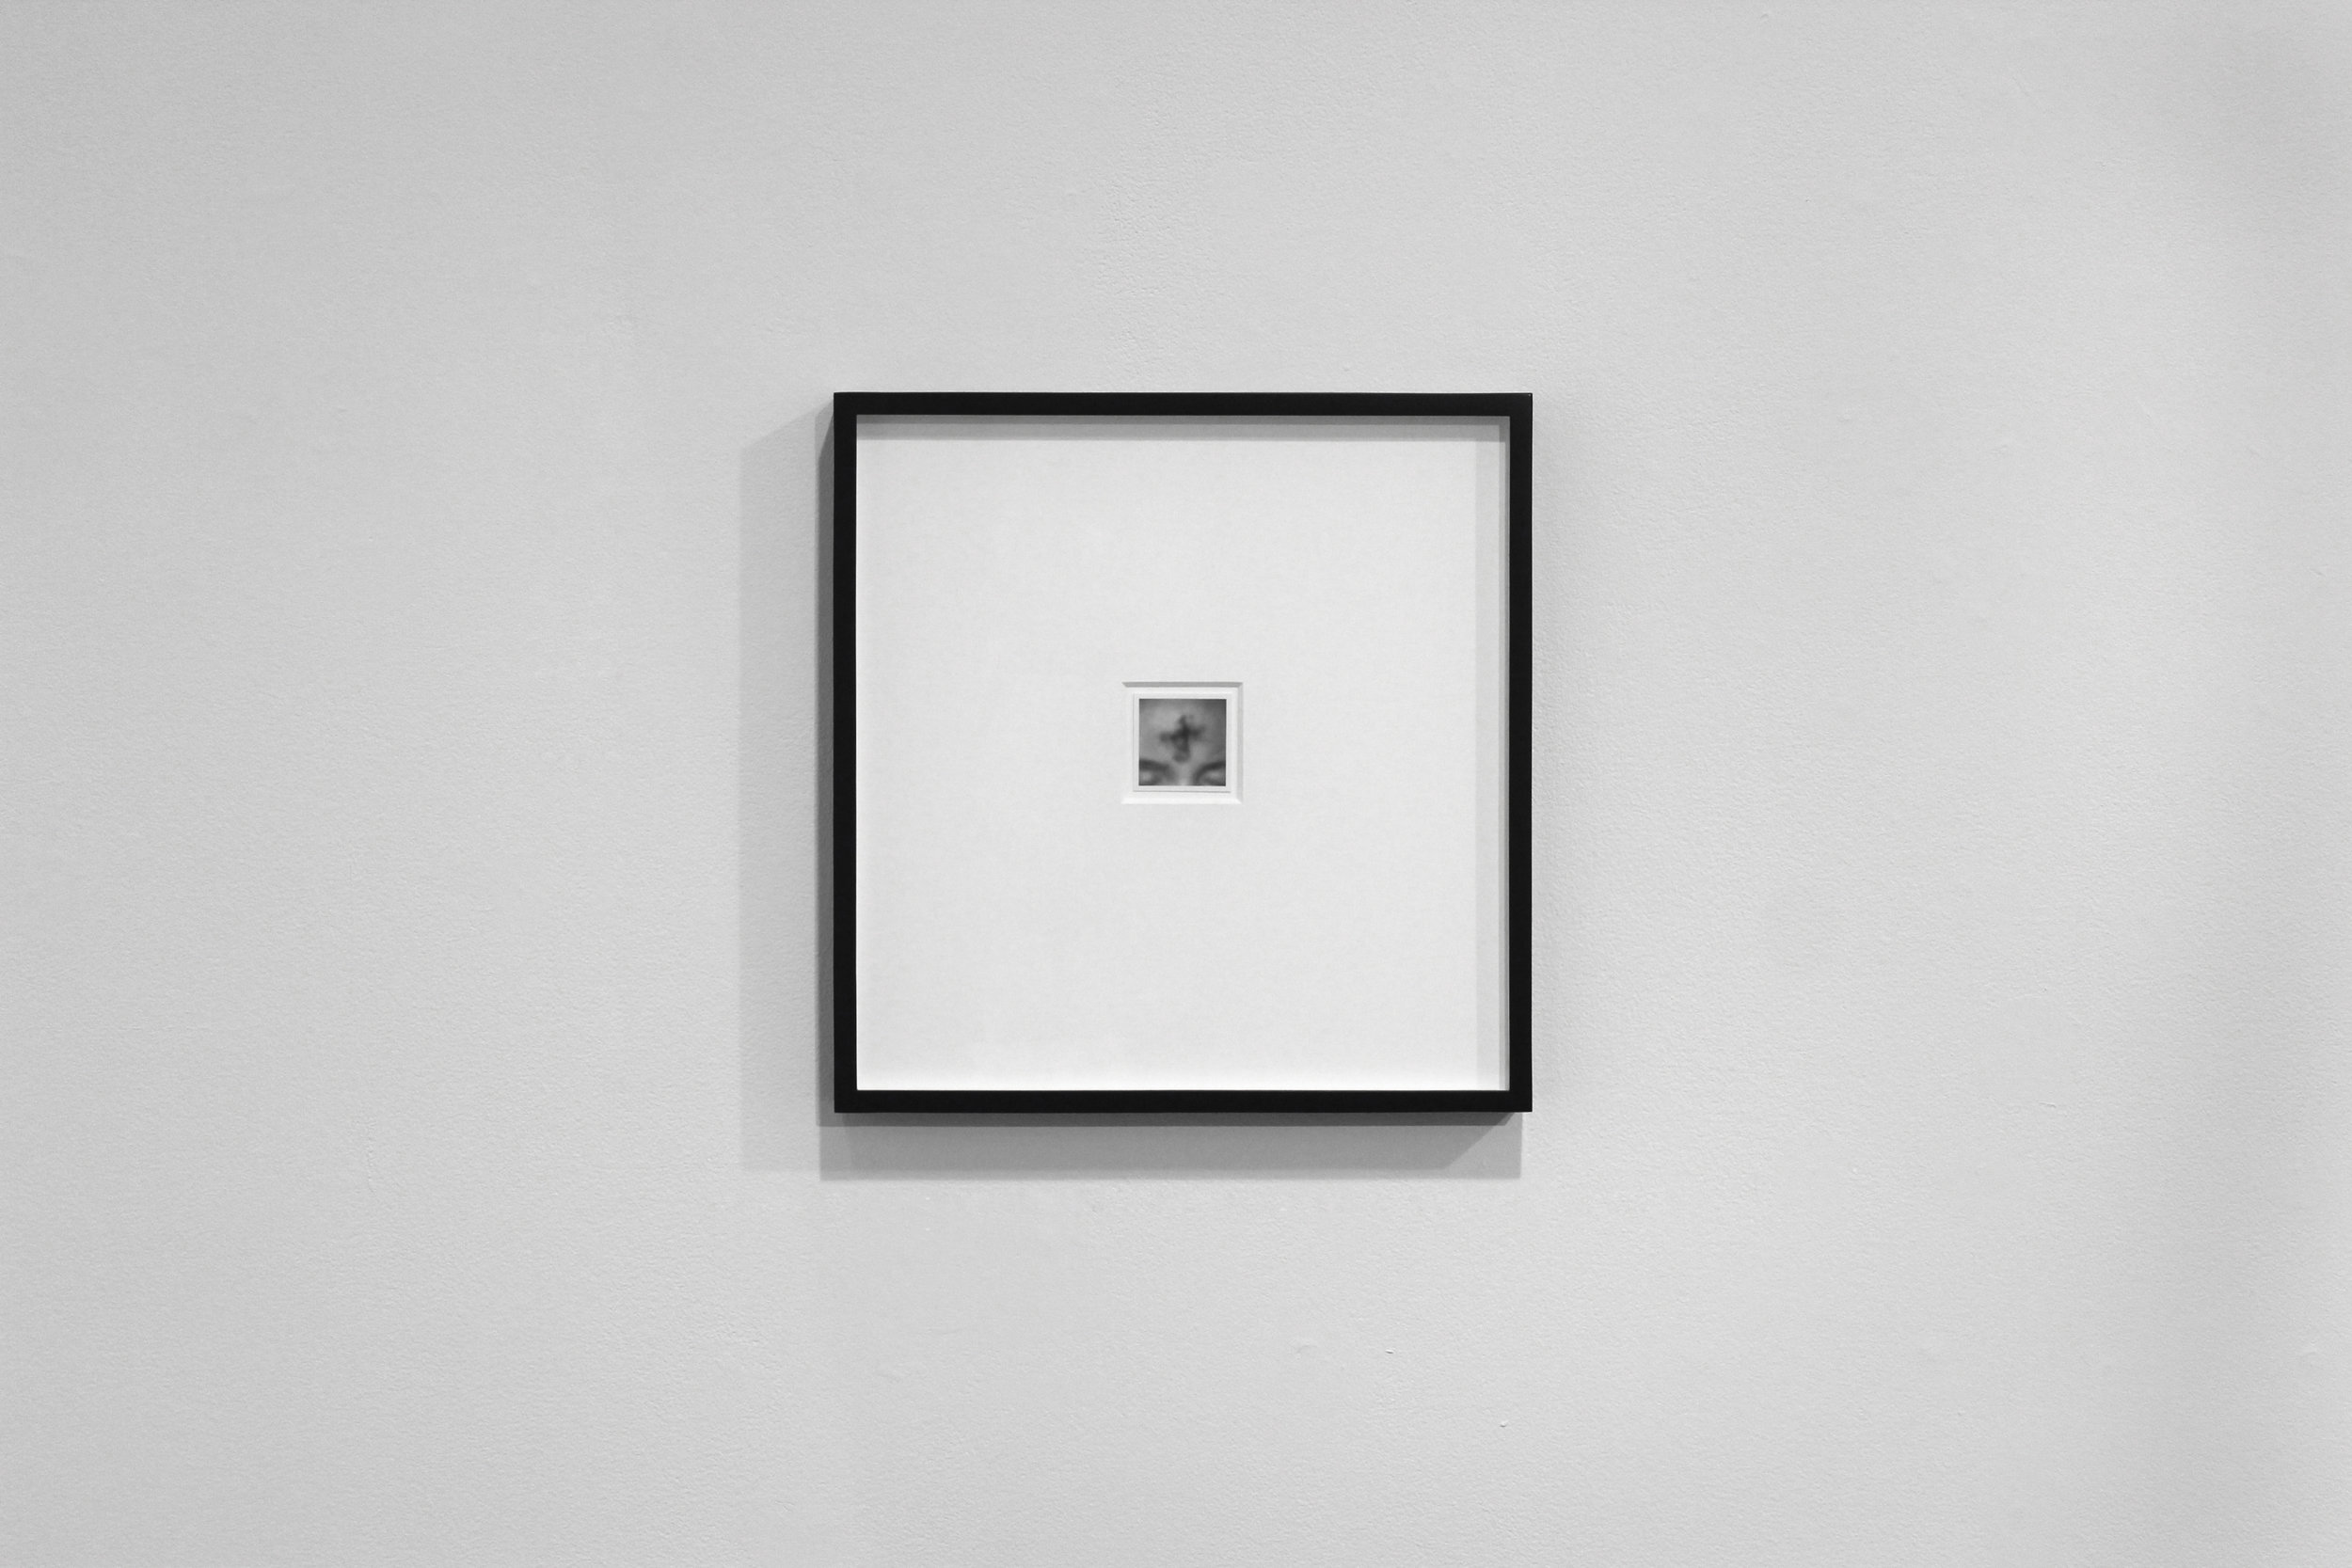 Untitled 51:4, pencil on card, 5 x 5 cm, framed